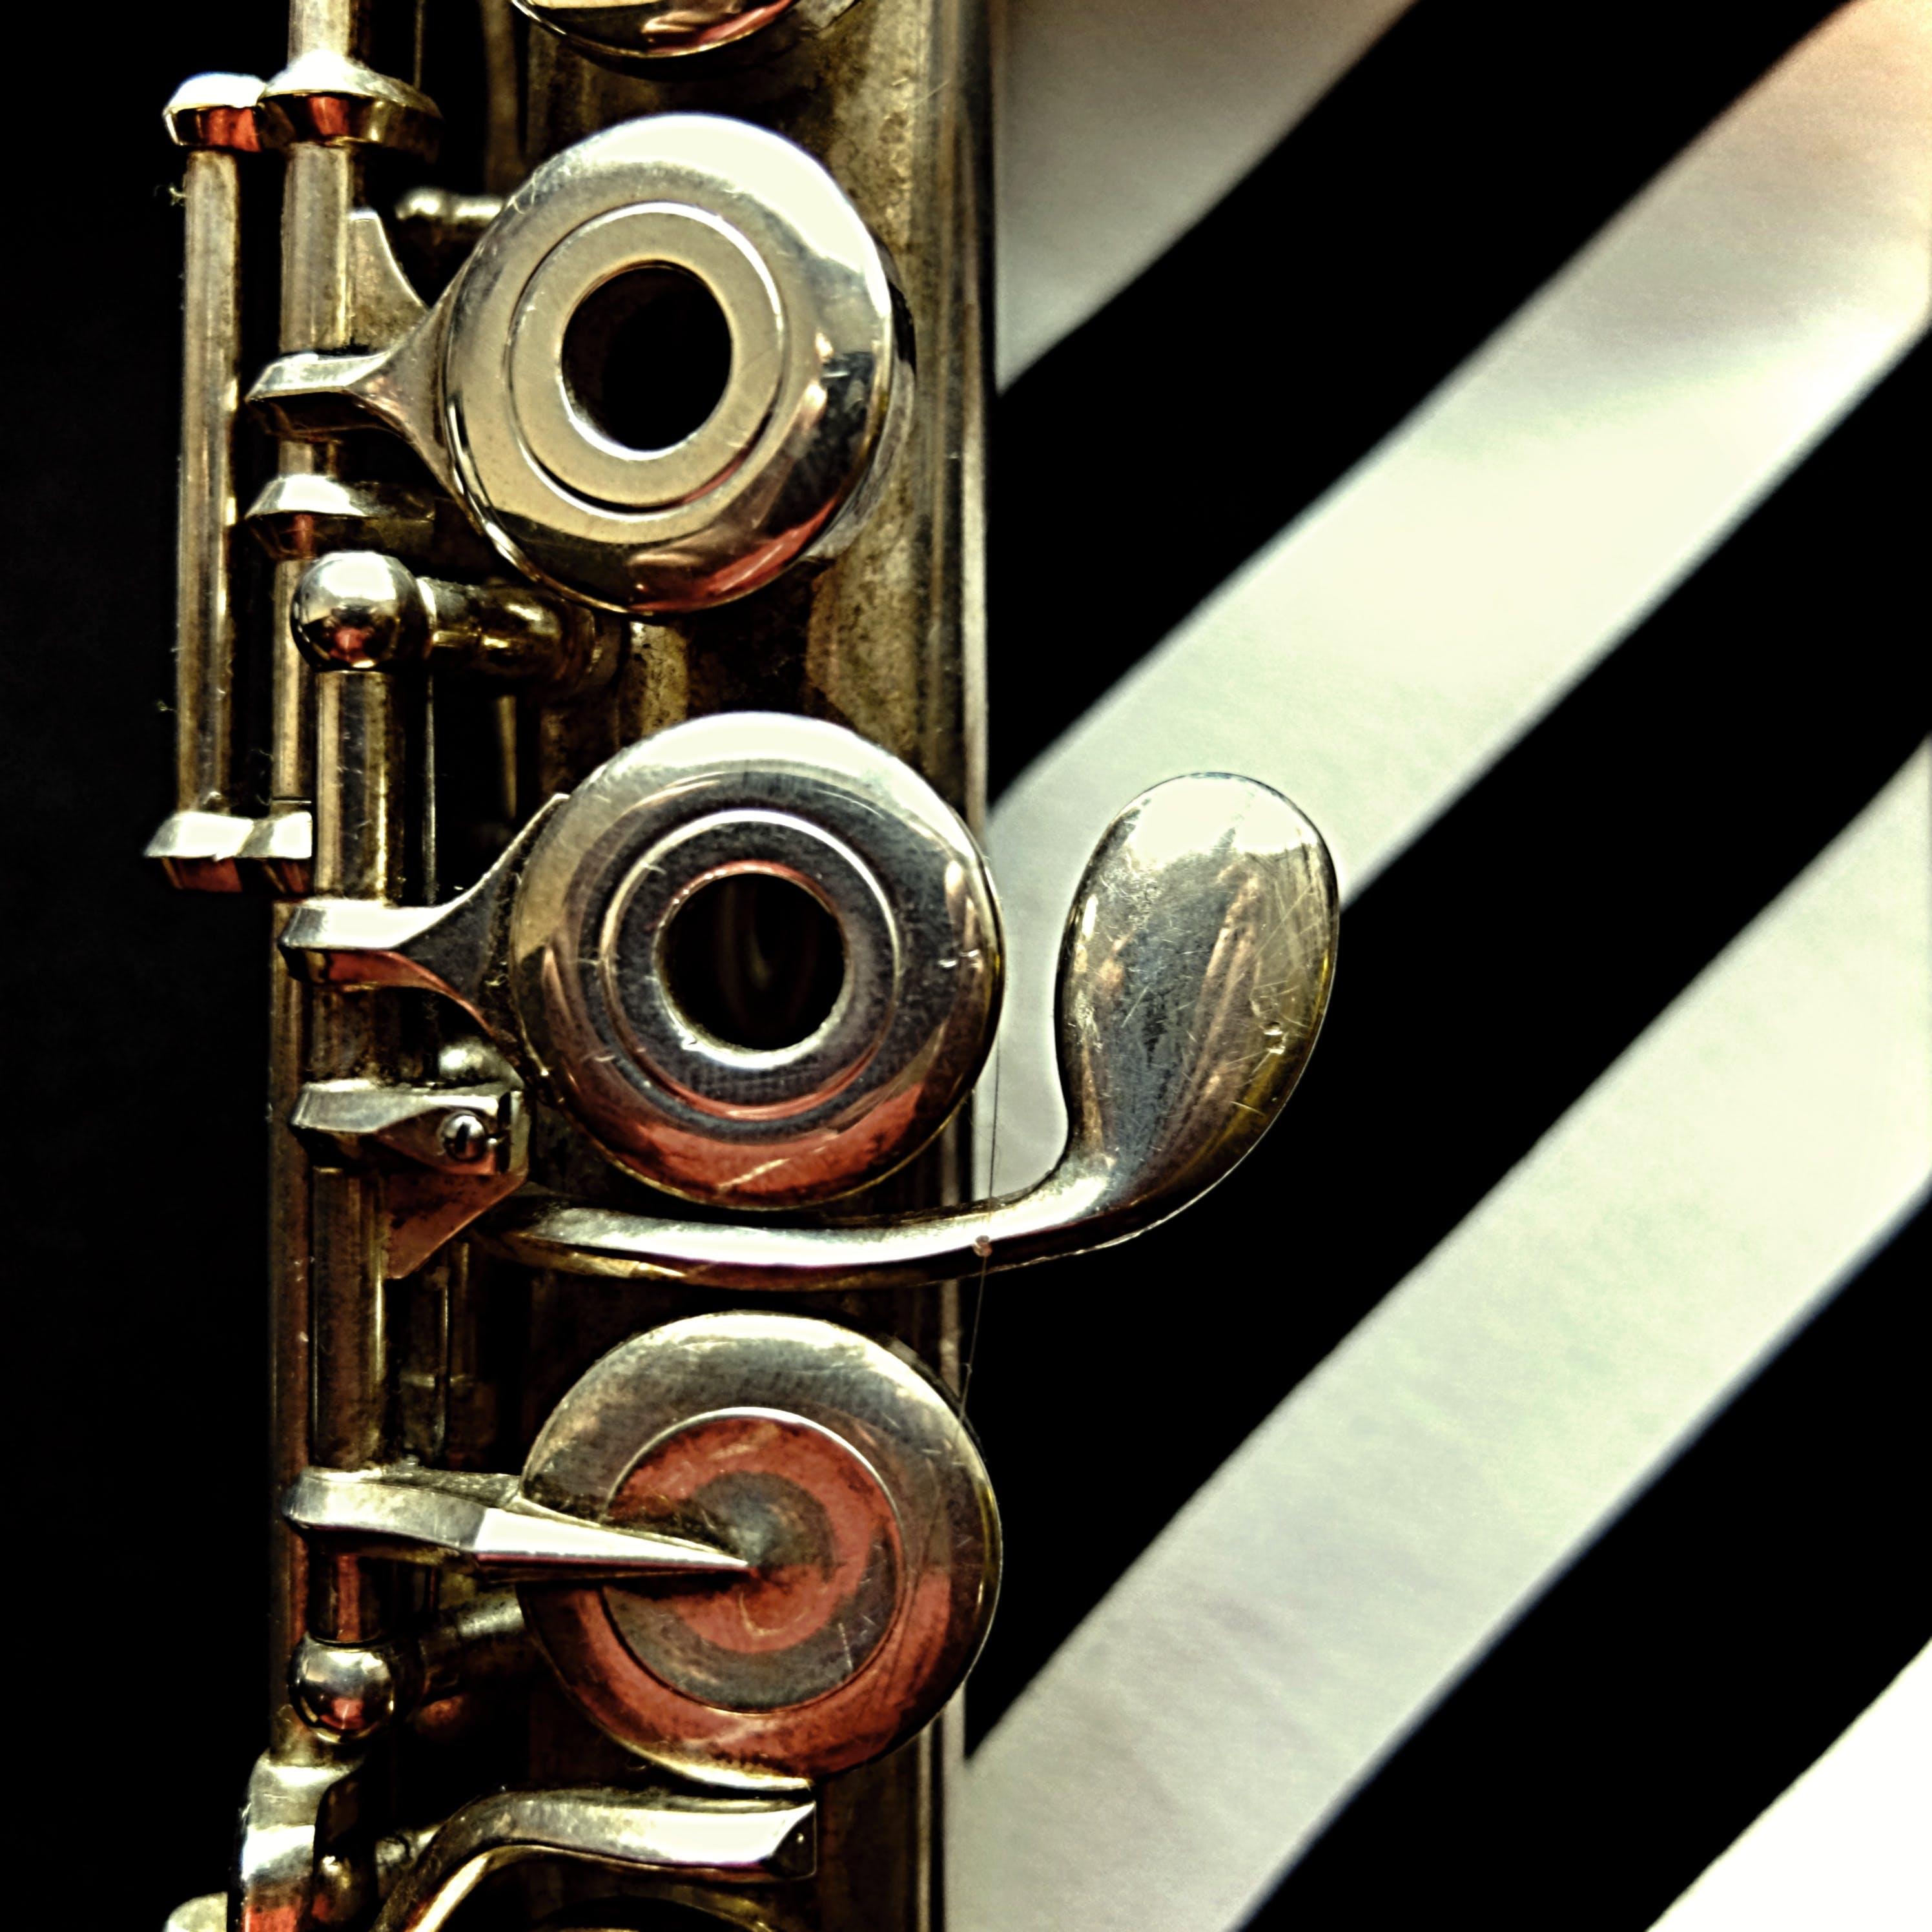 Free stock photo of metal, stripes, instrument, flute